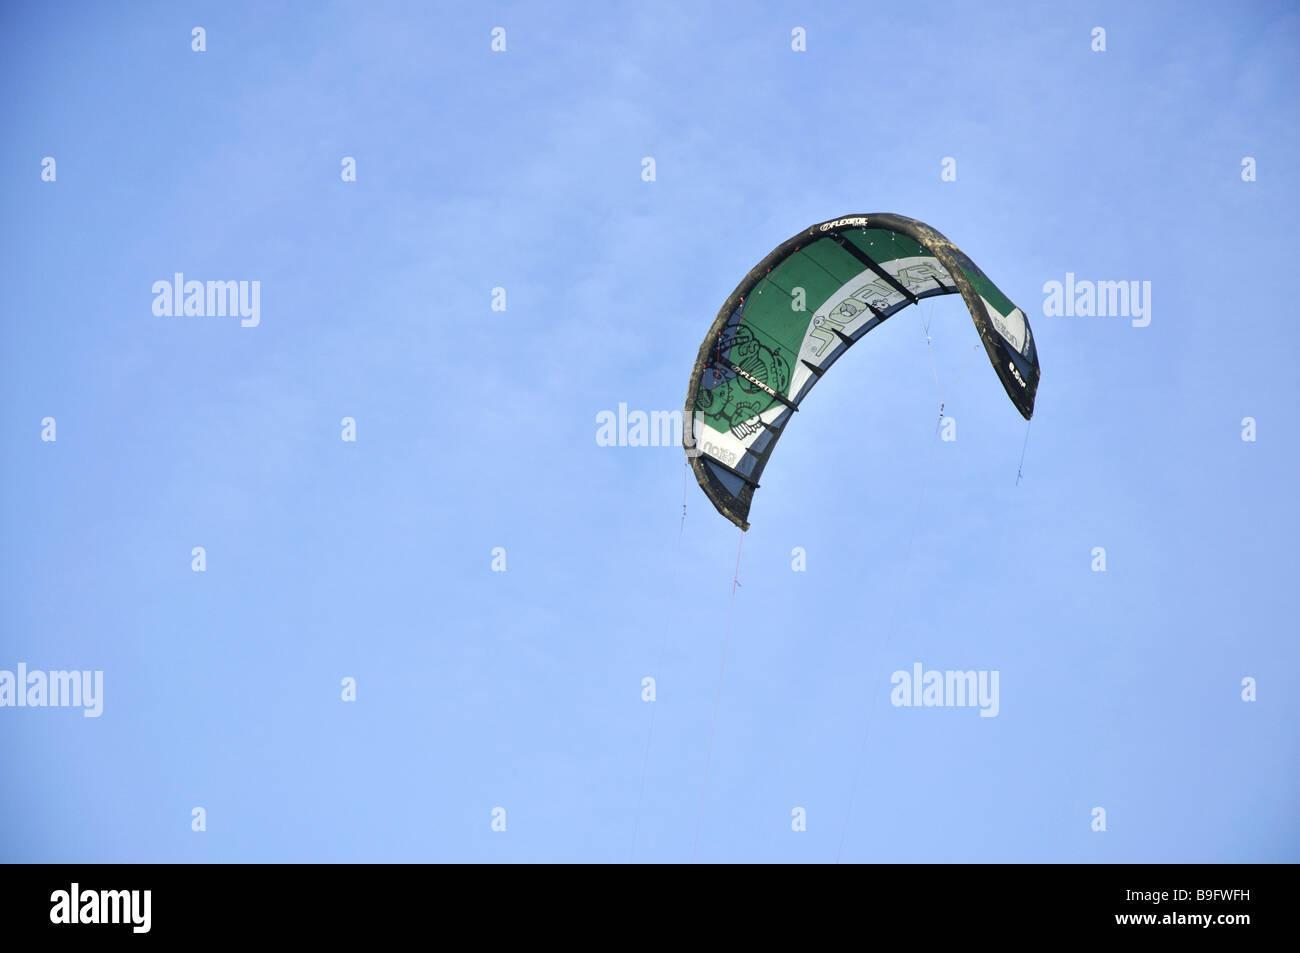 Green Kite - Stock Image